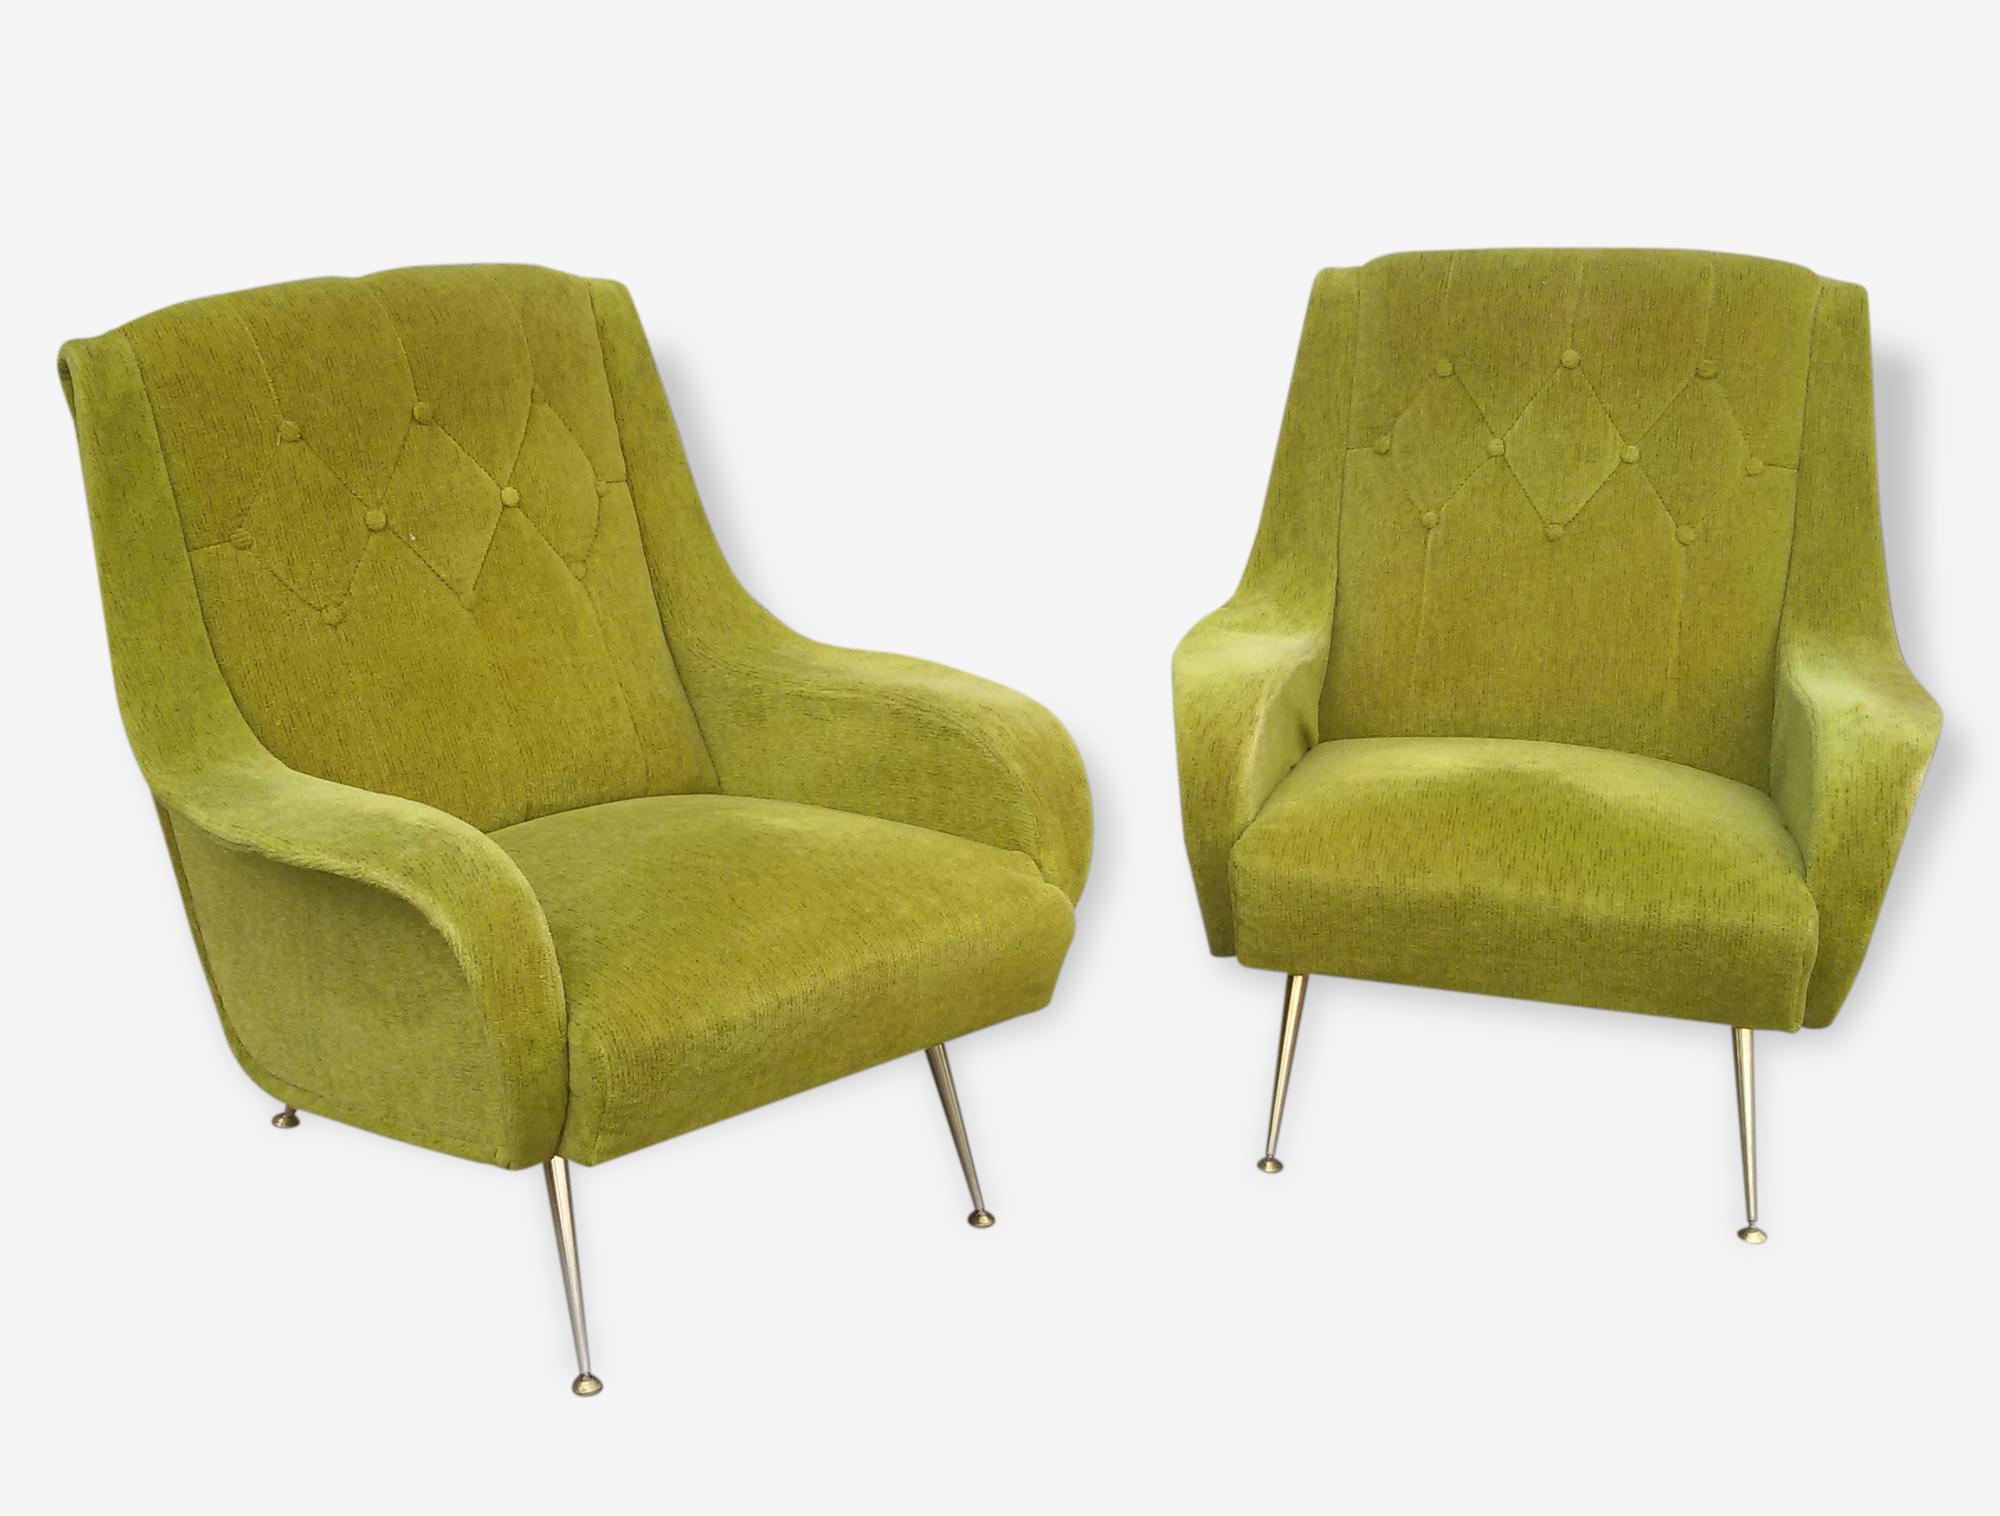 Paire de fauteuil design italien tissu vert design